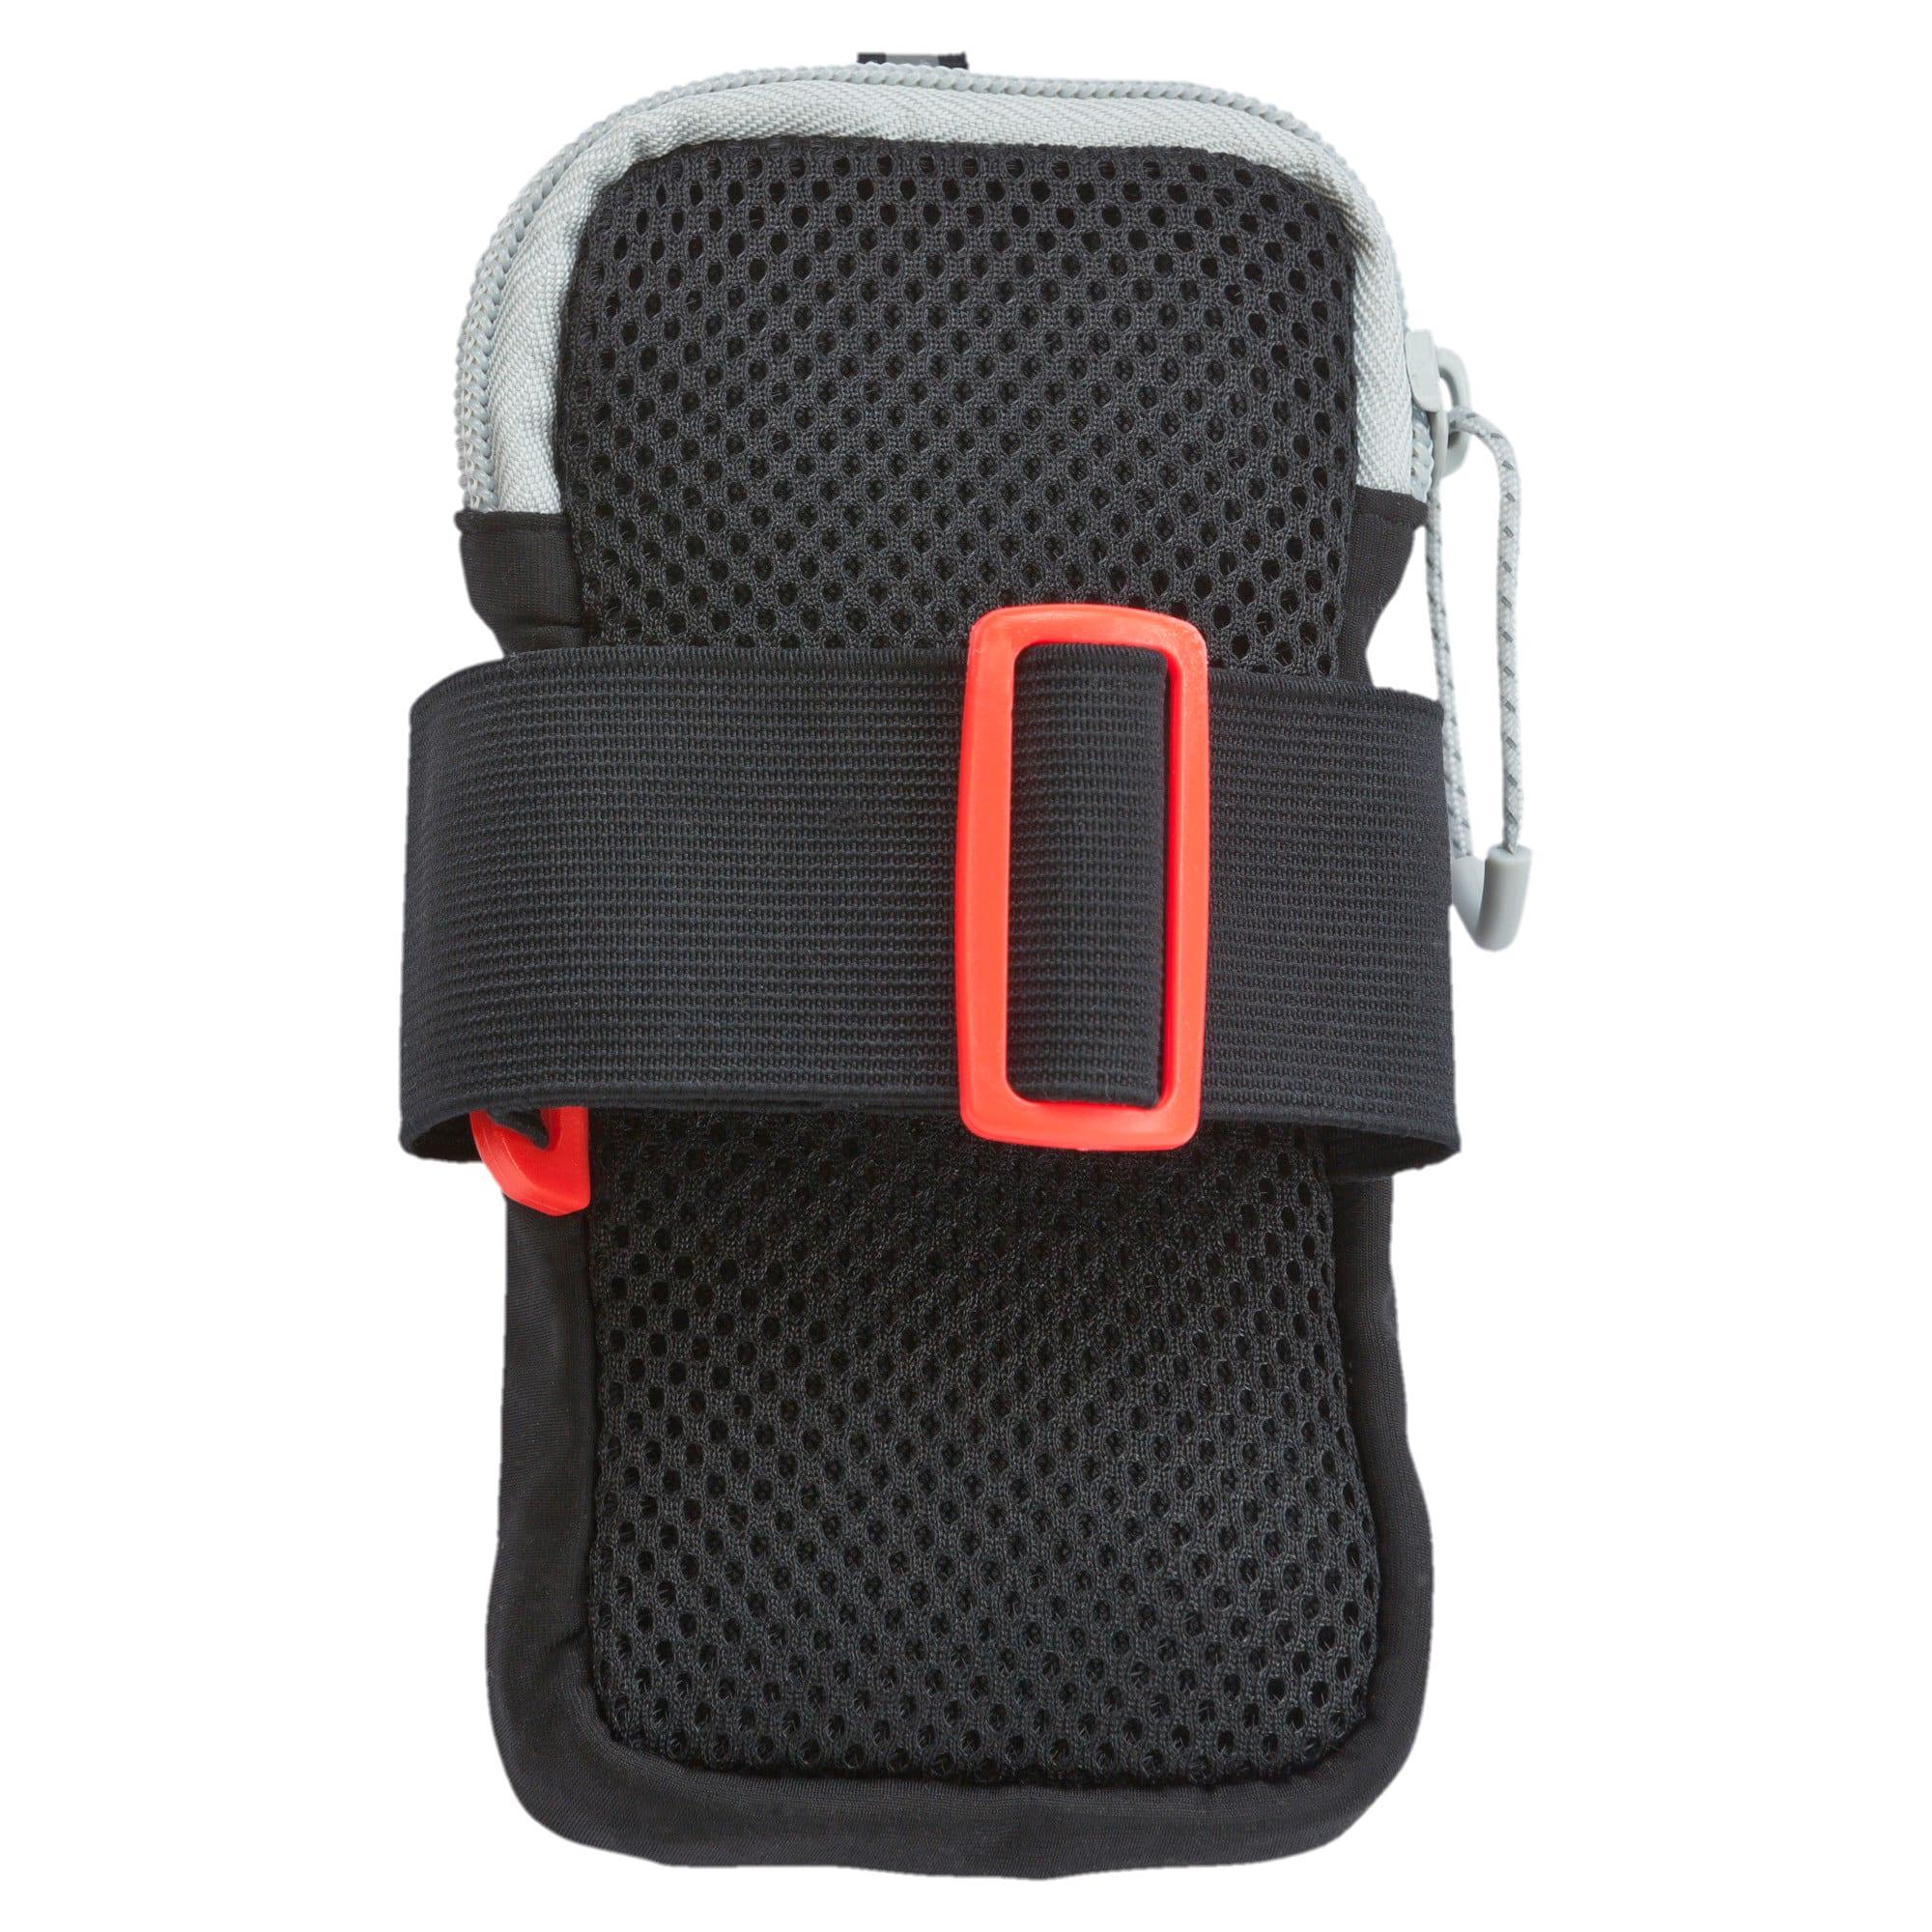 Thumbnail 2 of PR Arm Pocket, black-reflective-graphic, medium-IND